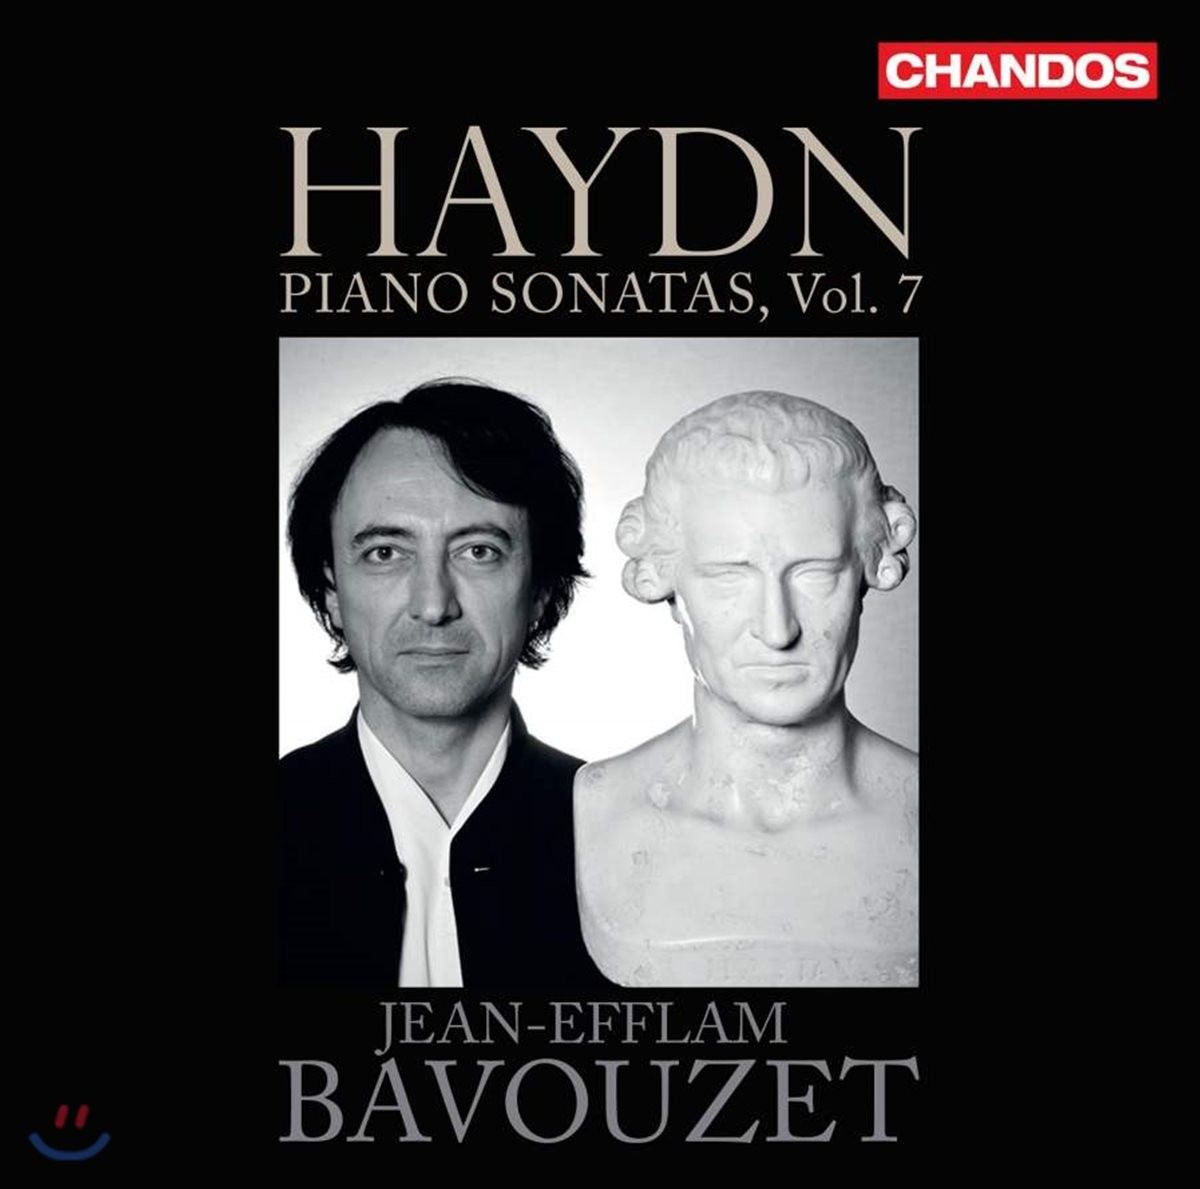 Jean-Efflam Bavouzet 하이든: 피아노 소나타 7집 - 장-에플랑 바부제 (Haydn: Piano Sonatas Vol.7)